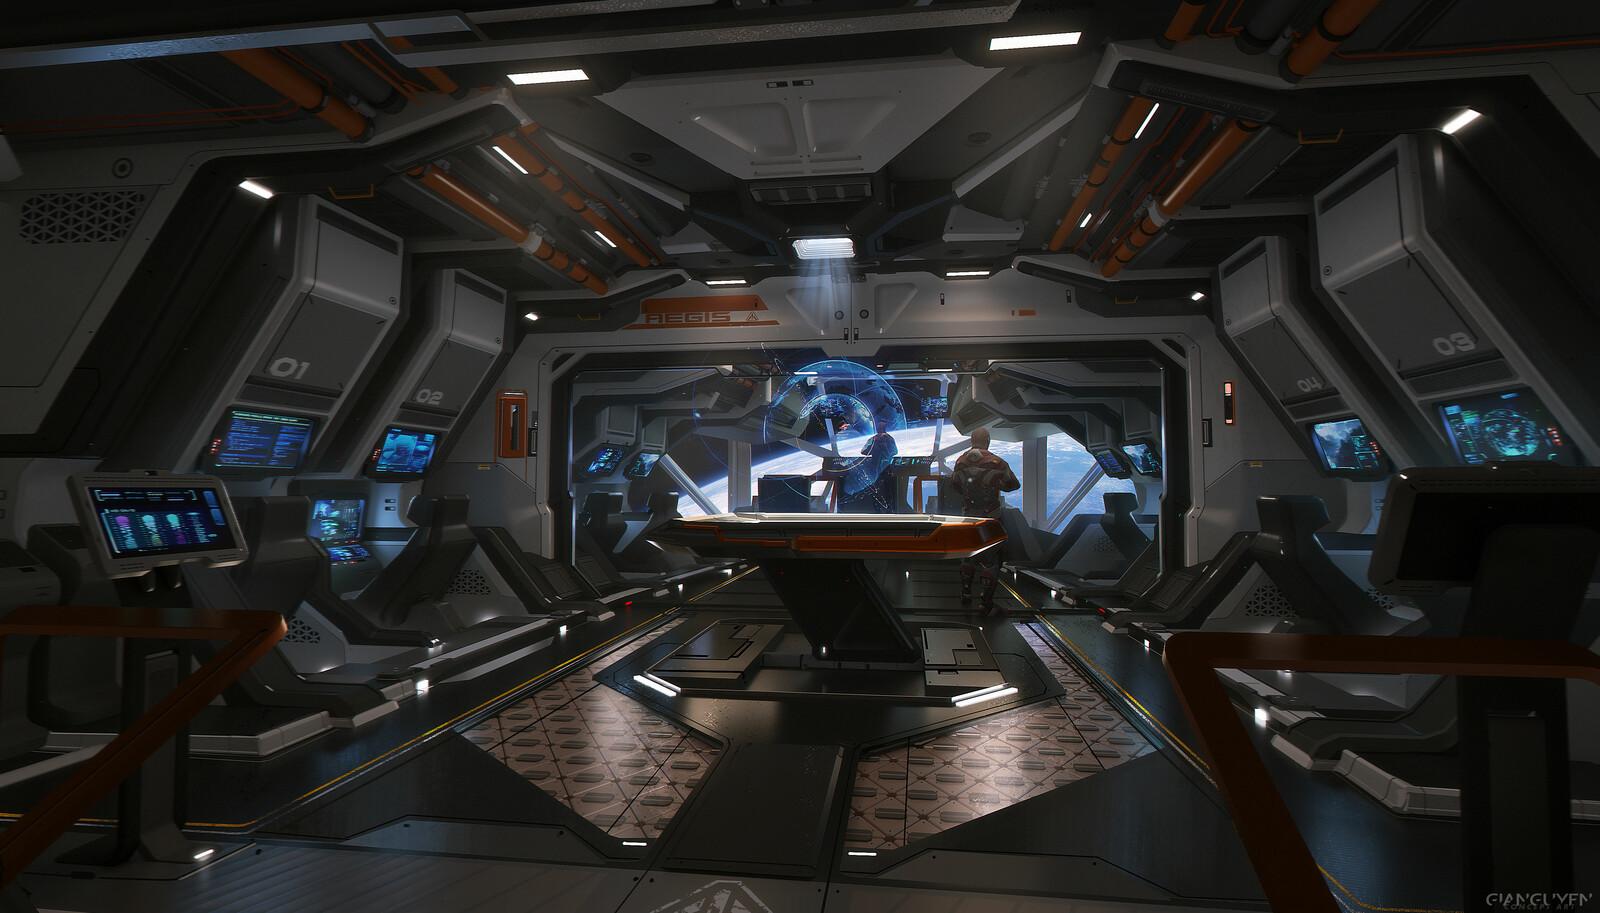 Scifi Environments